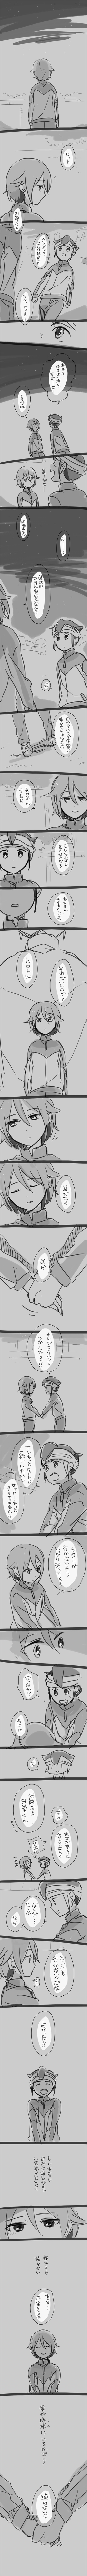 Tags: Anime, Tukemono6, Inazuma Eleven, Kiyama Hiroto, Endou Mamoru, Pixiv, Translation Request, Comic